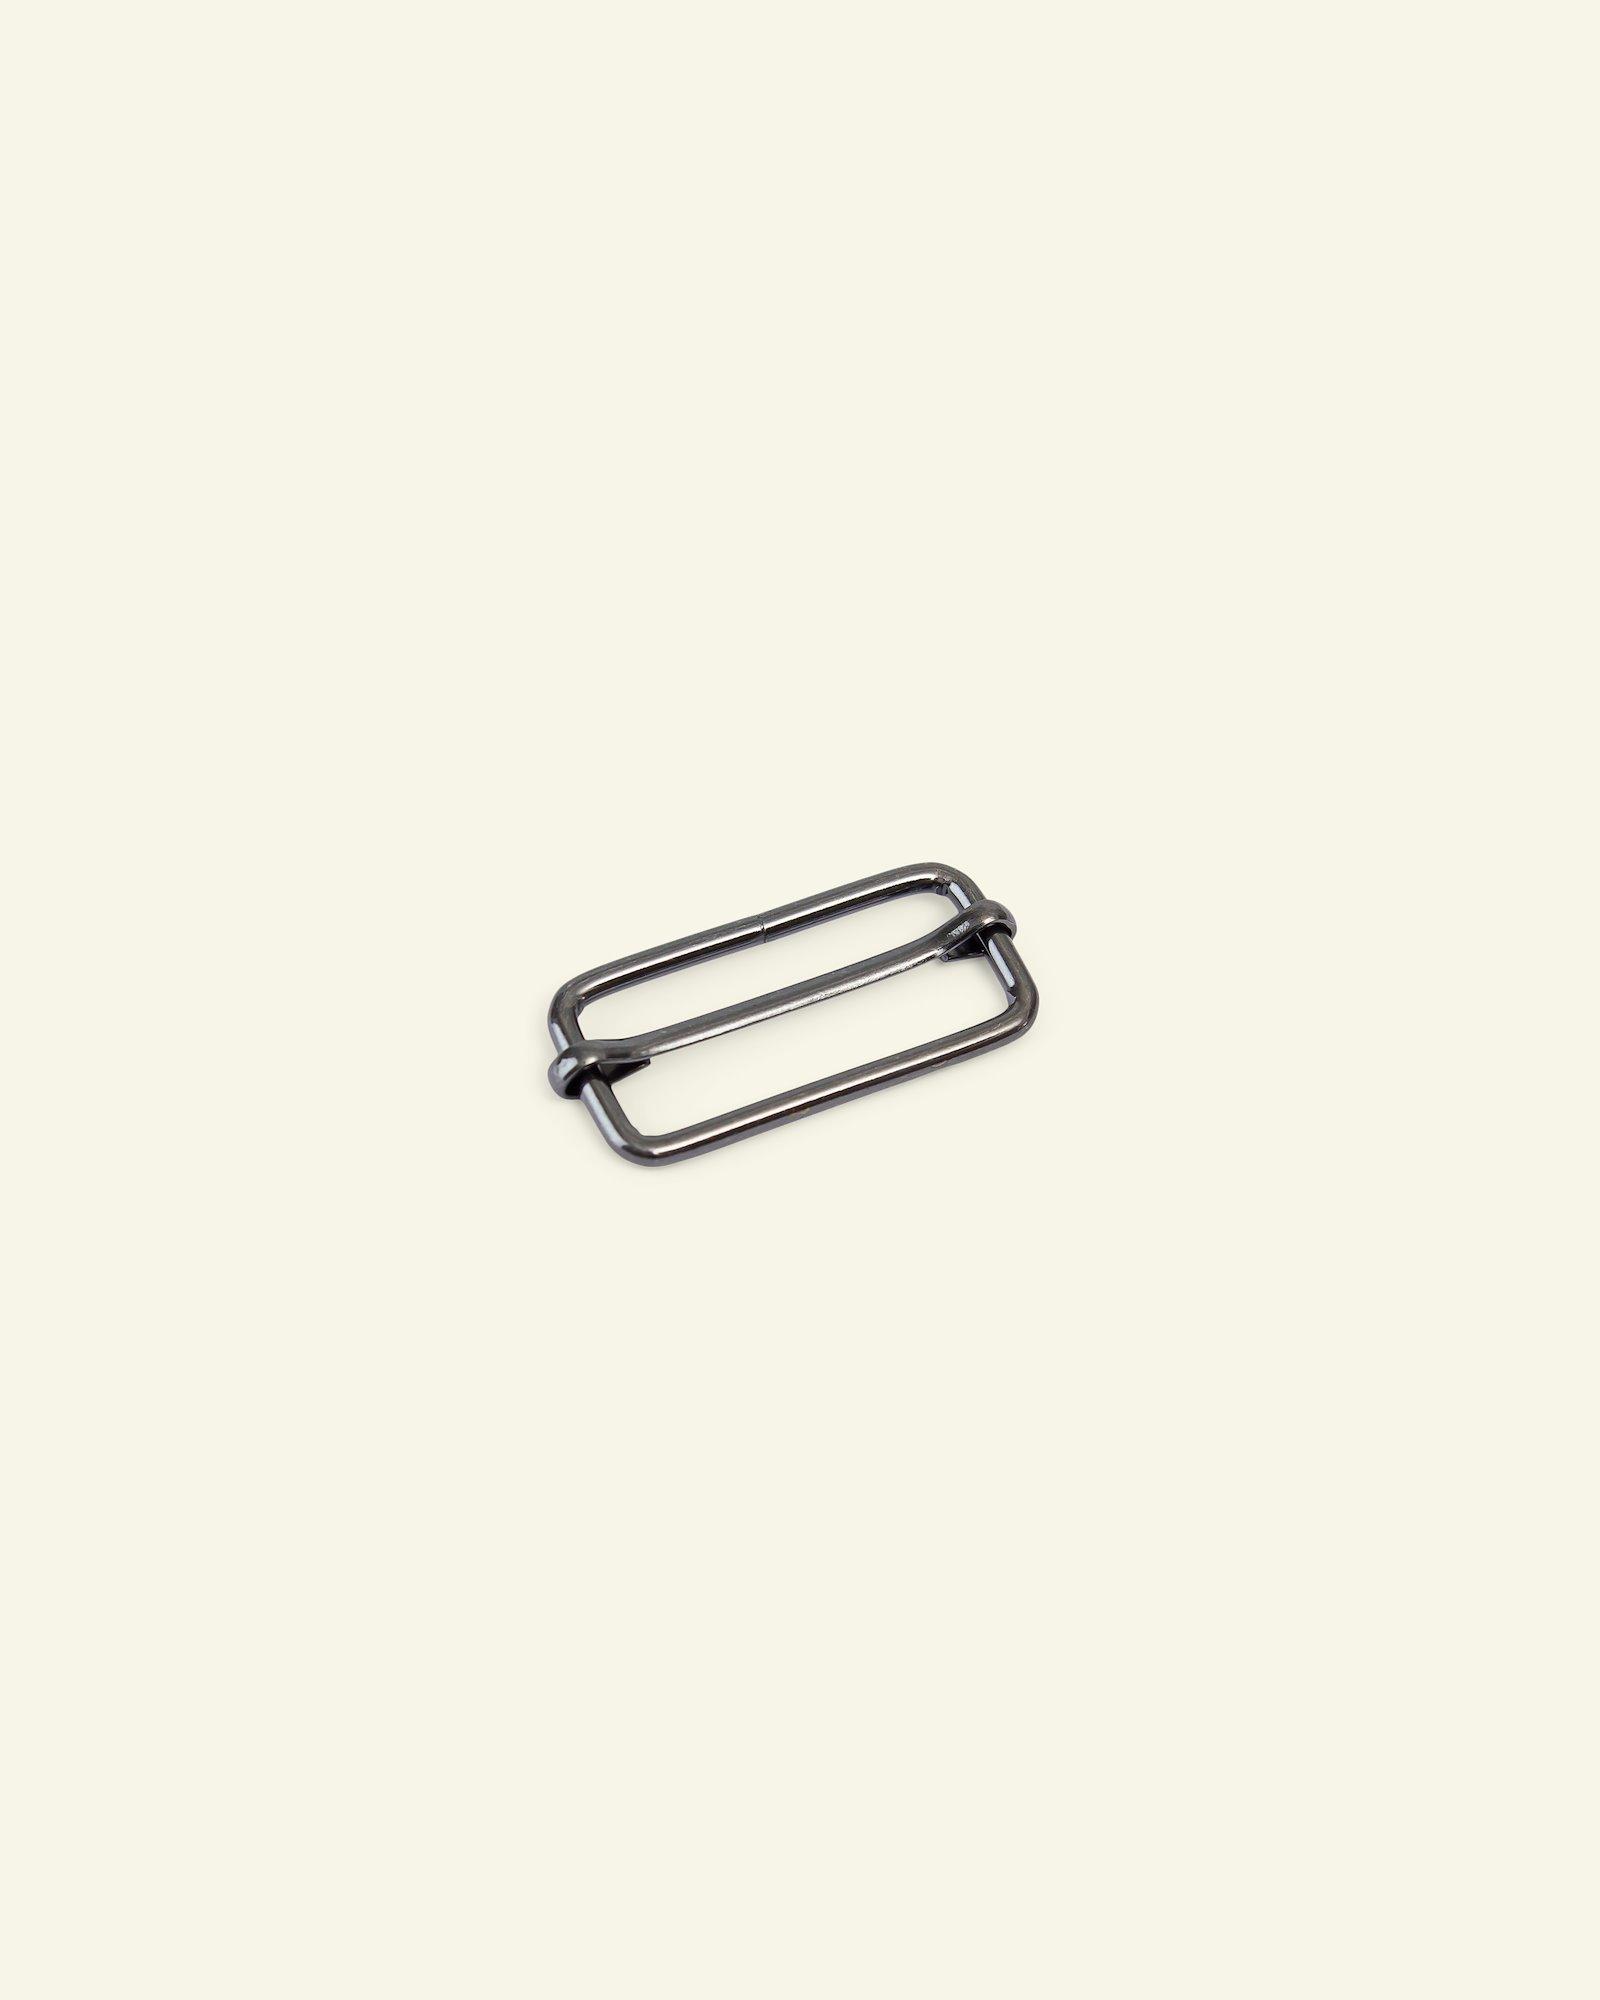 Buckle metal 38x16x3mm dark silver 1pc